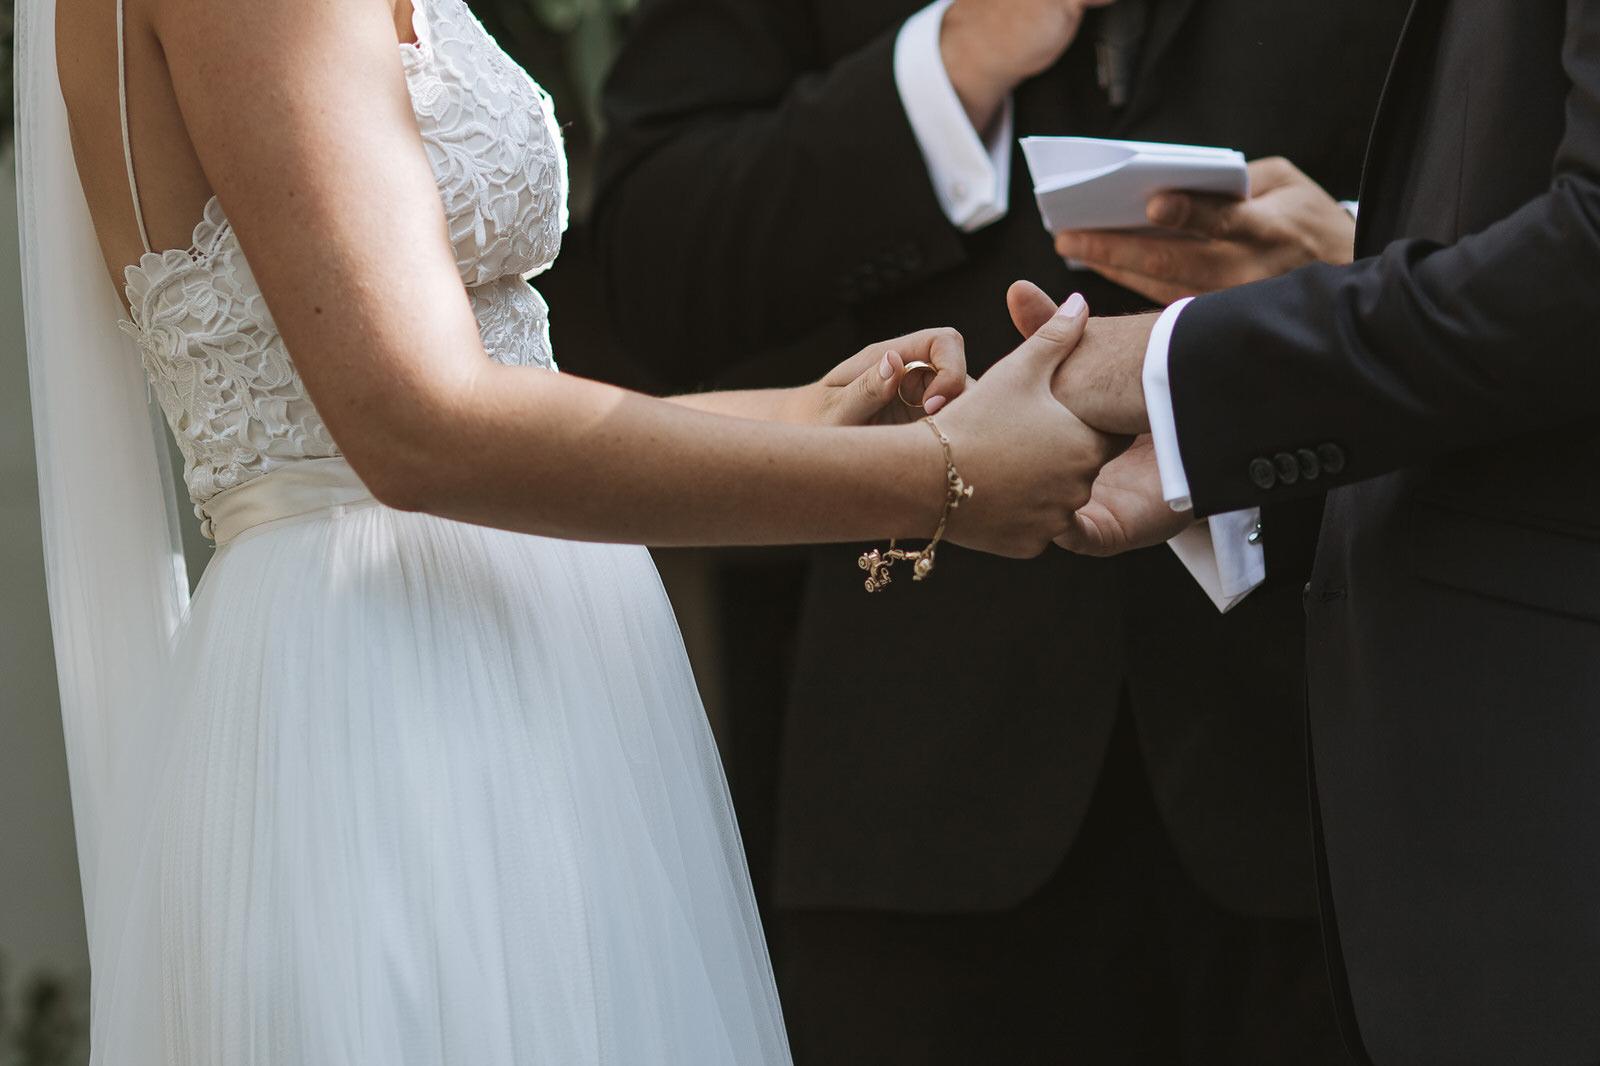 newfound-r-s-ataahua-garden-venue-tauranga-wedding-067